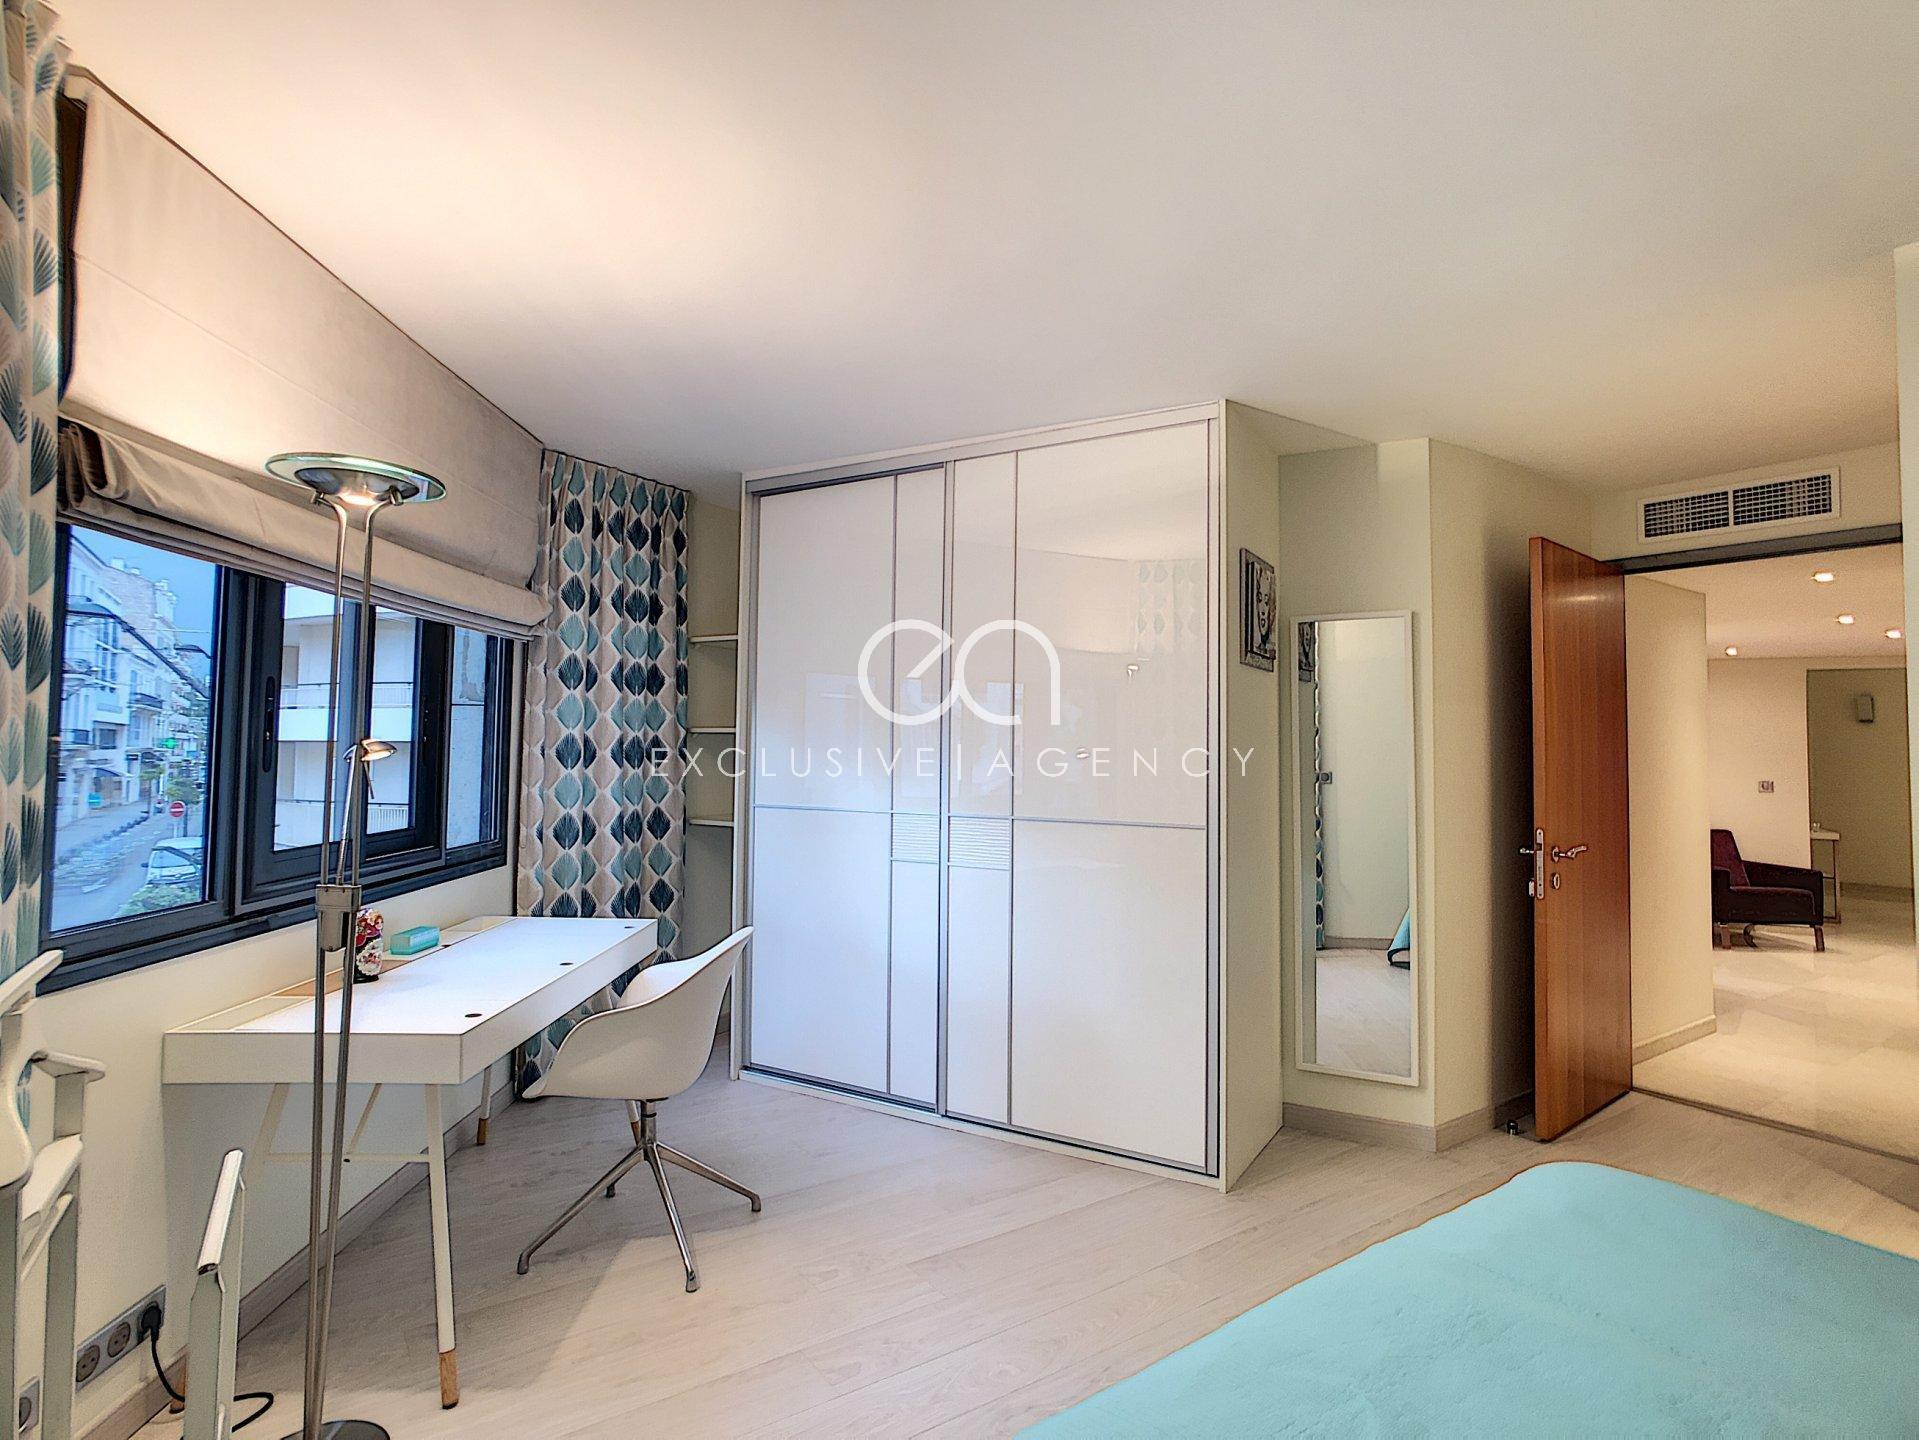 RENTAL PER MONTH CANNES CENTER 6-room appartement 250sqm terrace 60sqm